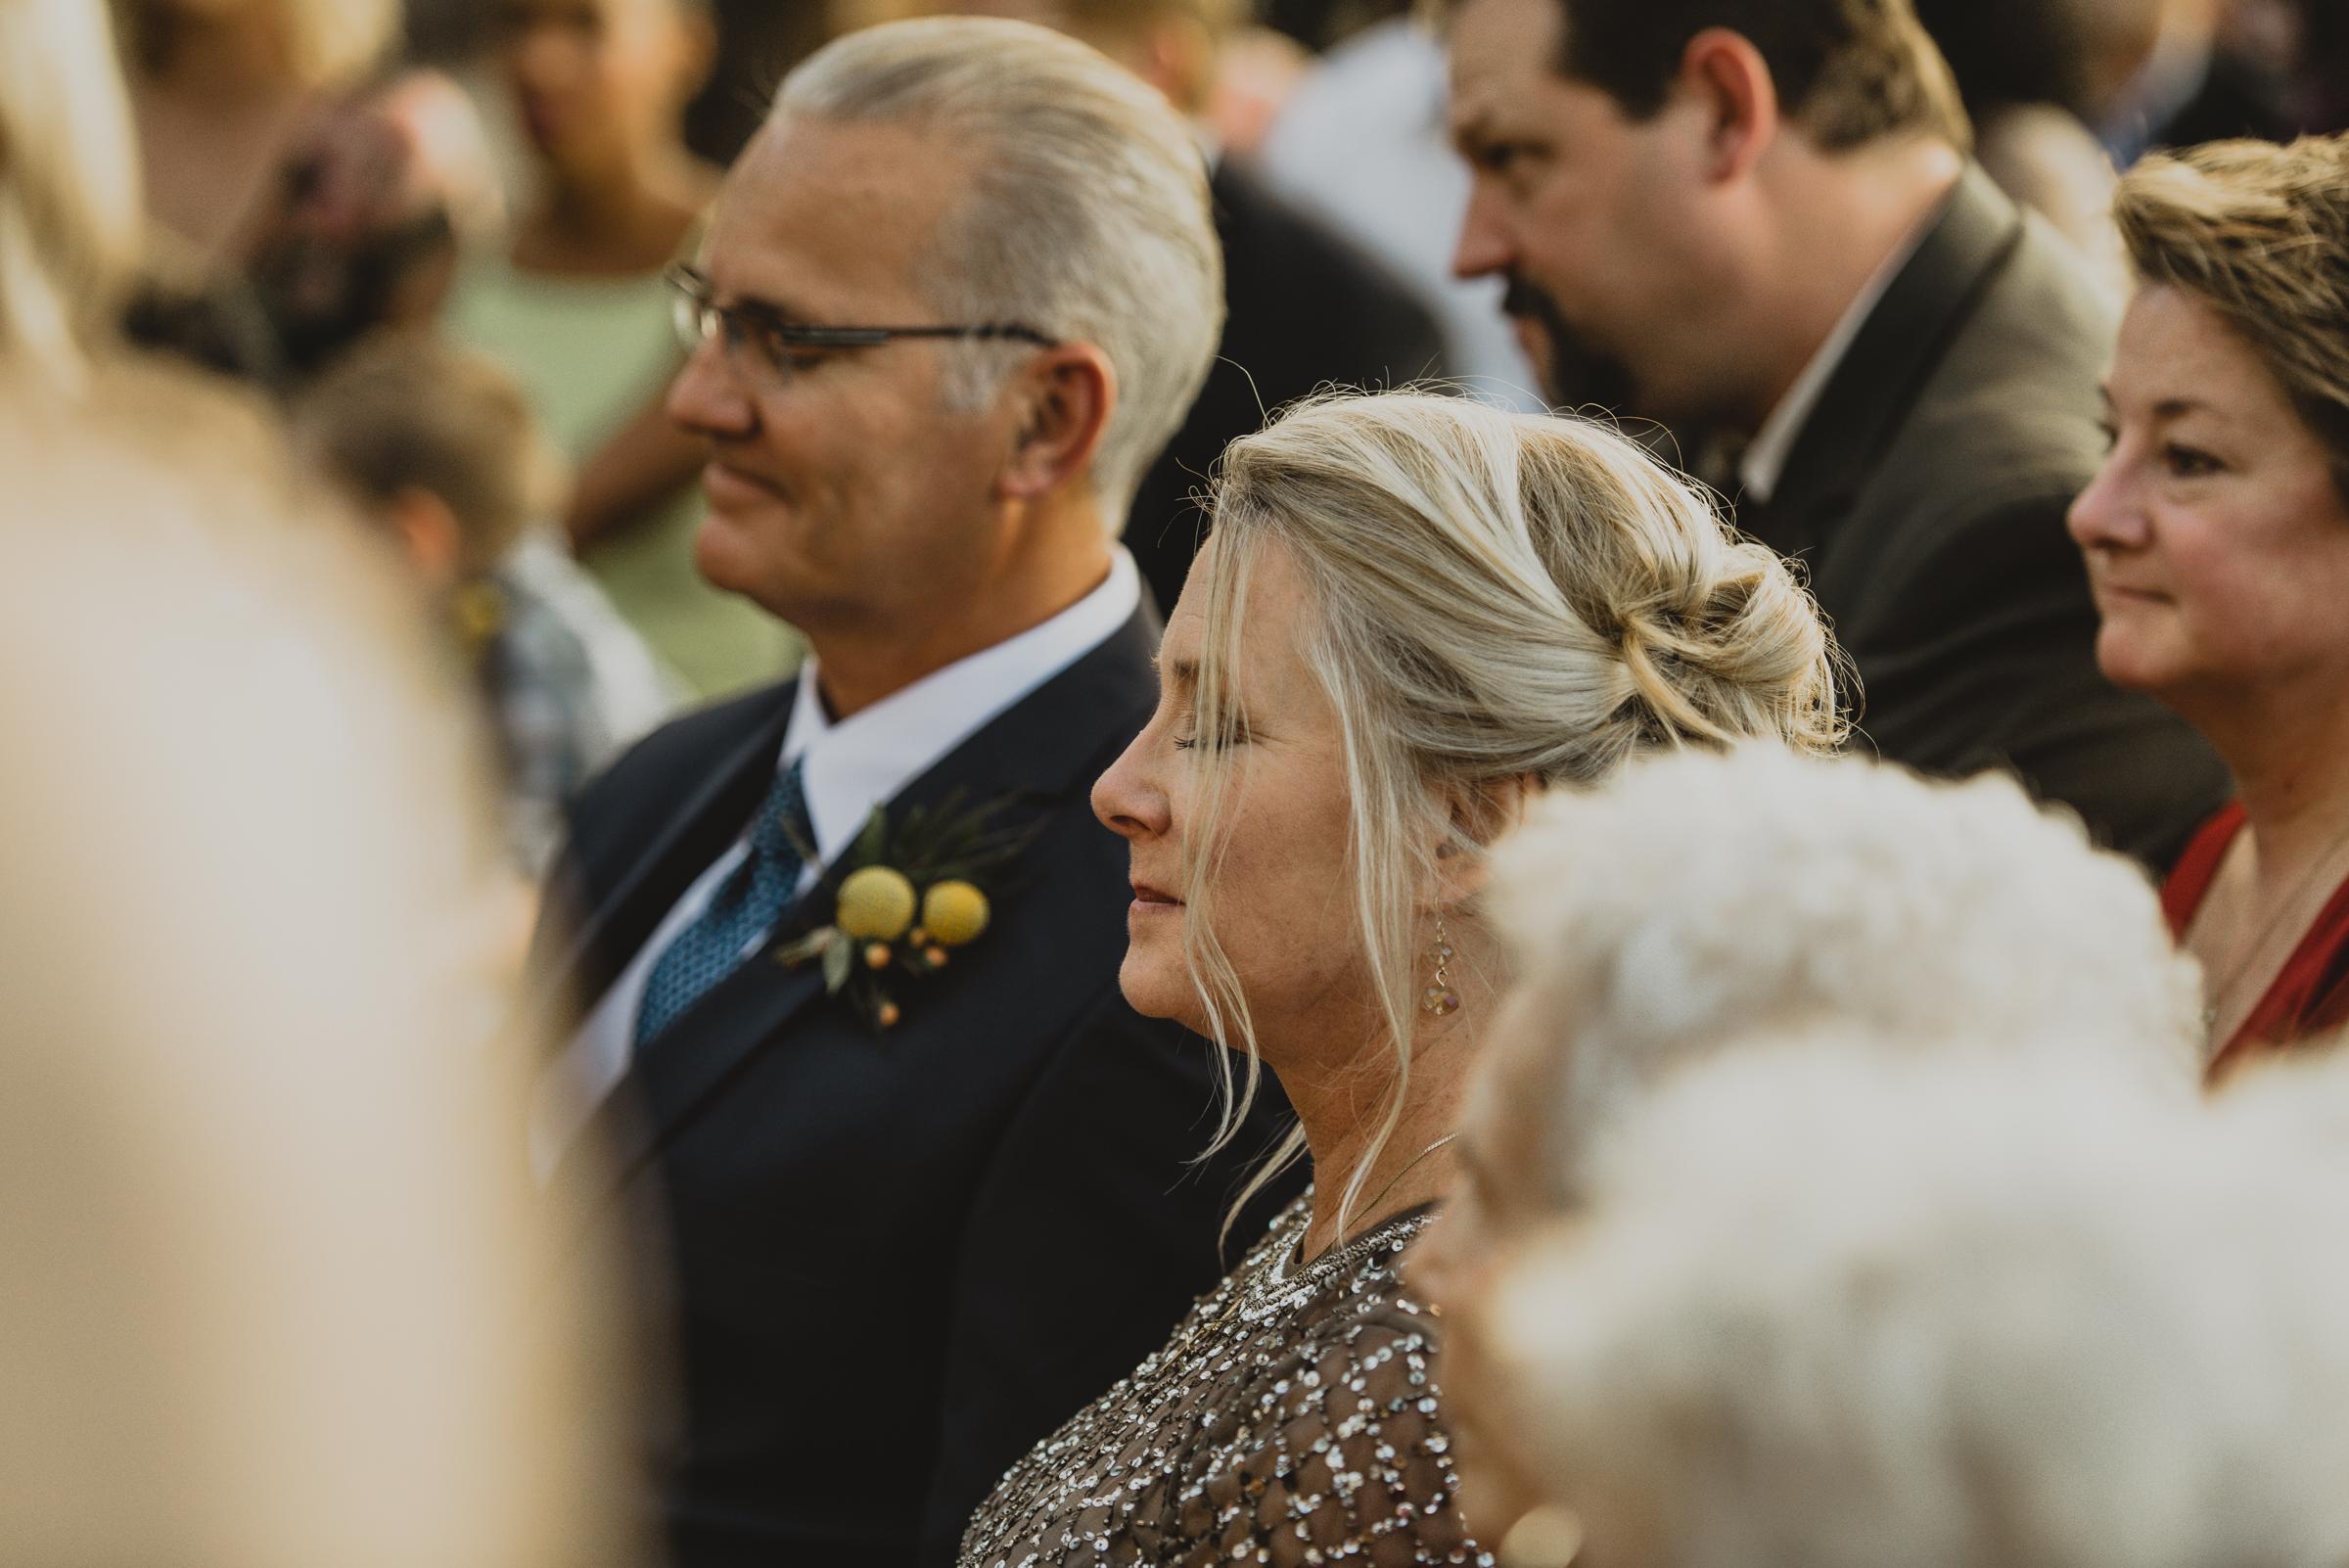 ©Isaiah + Taylor Photography - The Woodshed Booze Brothers Wedding, Vista California Wedding Photographer-71.jpg